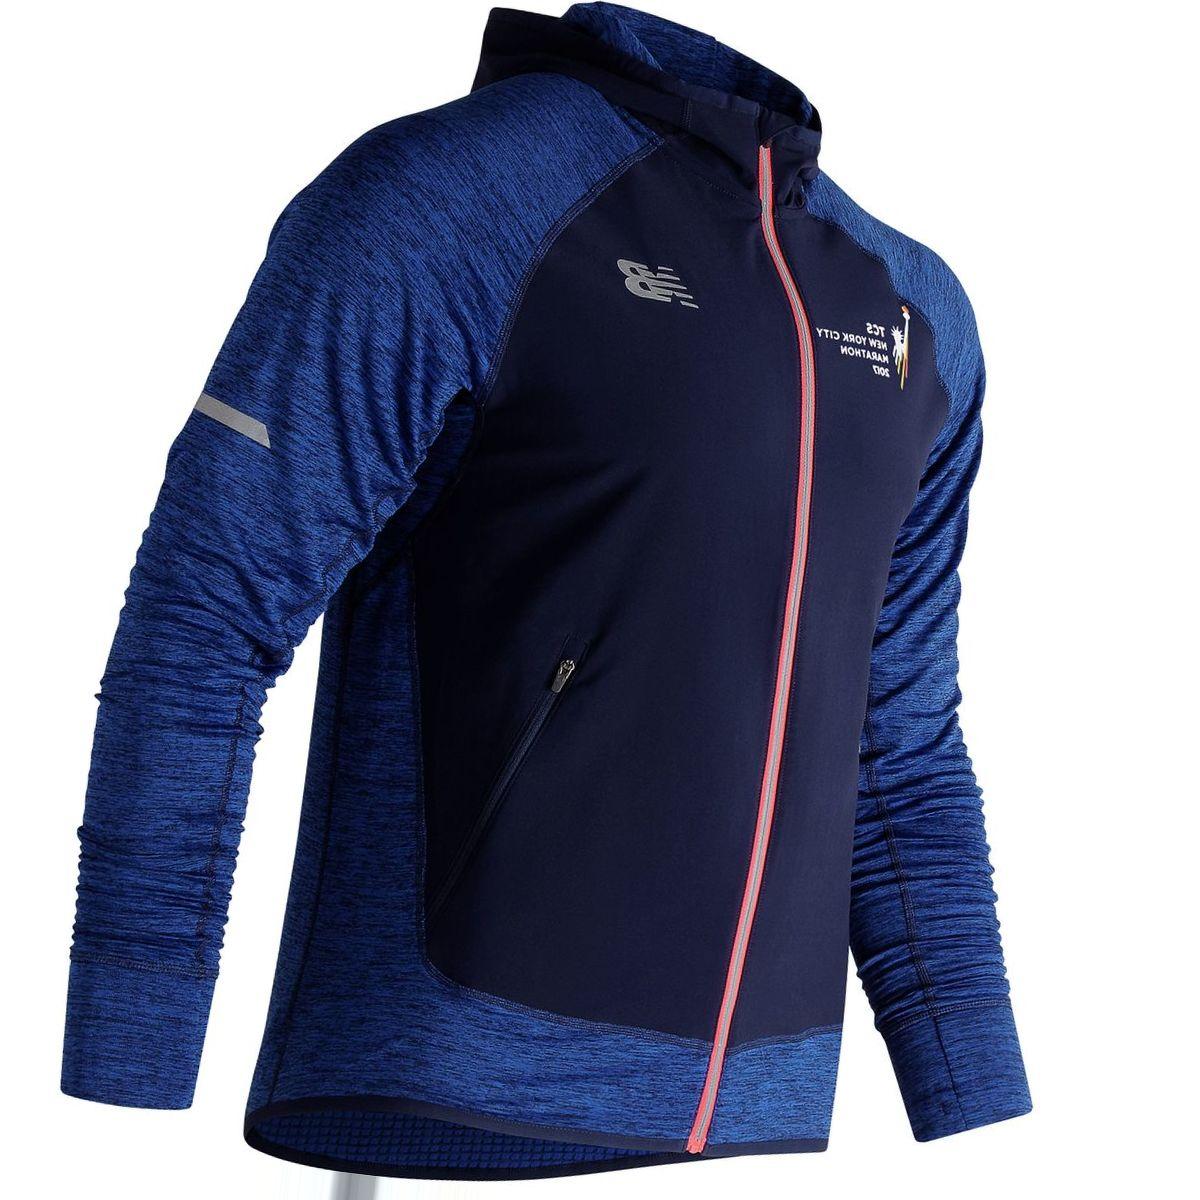 New Balance NB Heat Run Jacket - Men's